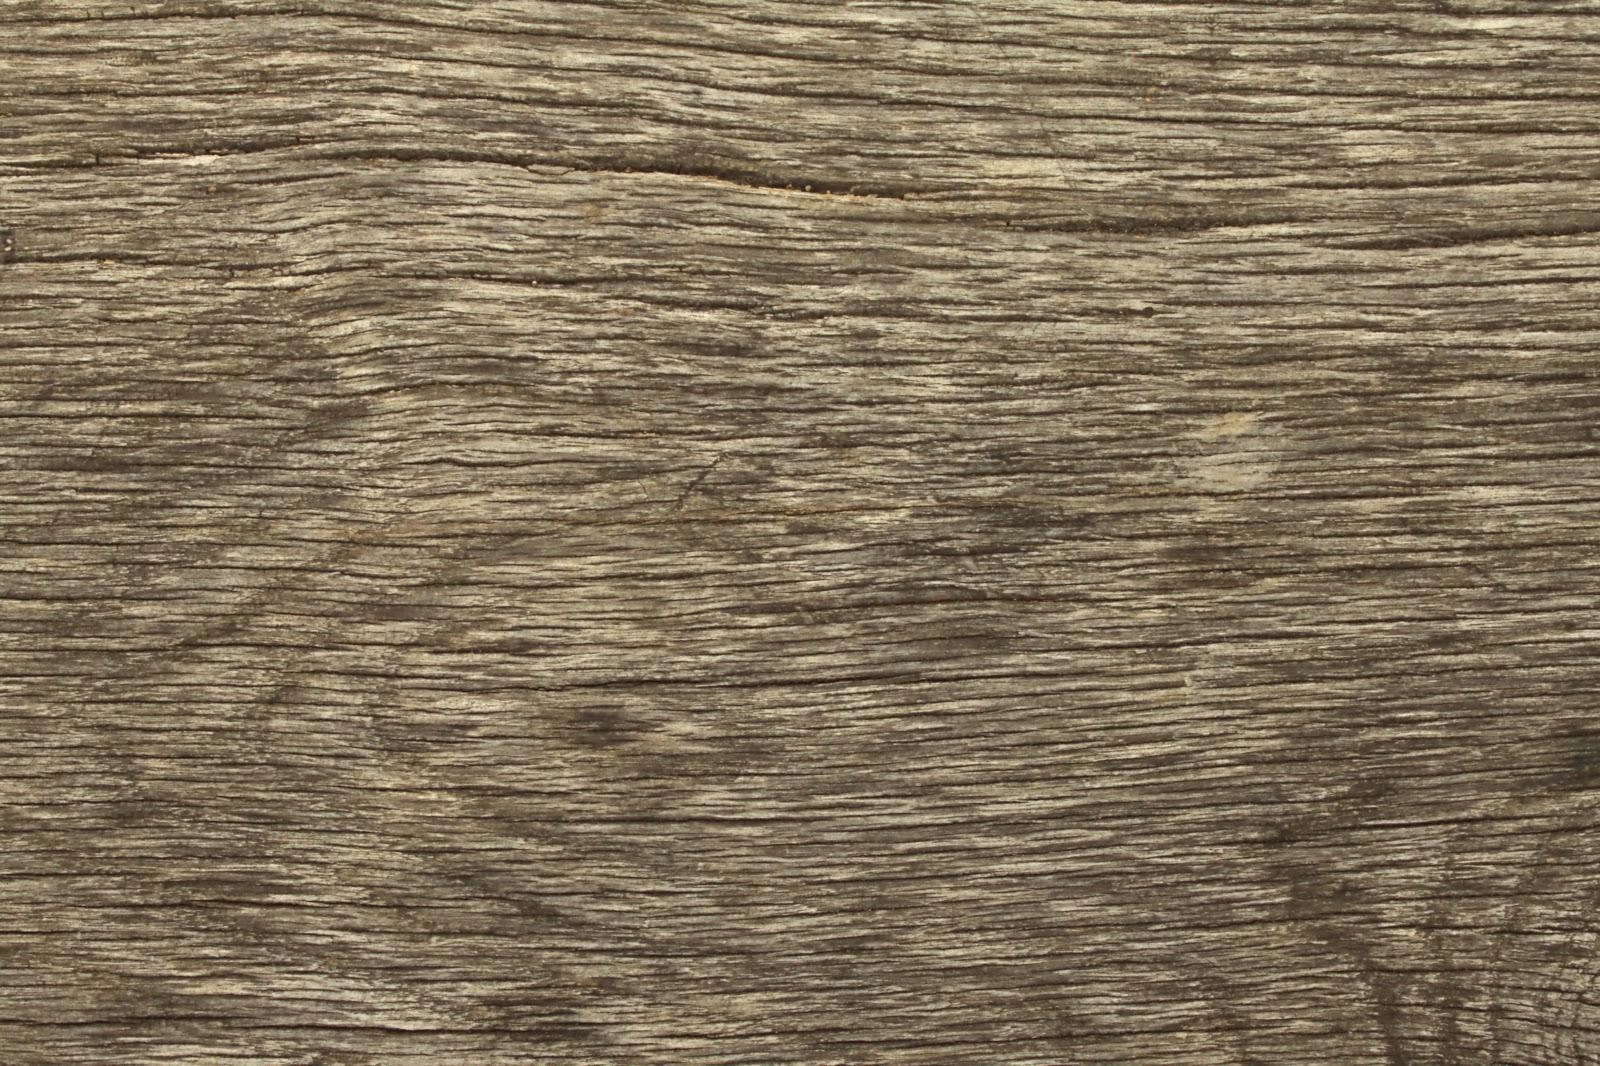 Wood dry cracked bench tree bark texture ver 3. High Resolution Seamless Textures   Wood 3  dry cracked bench tree